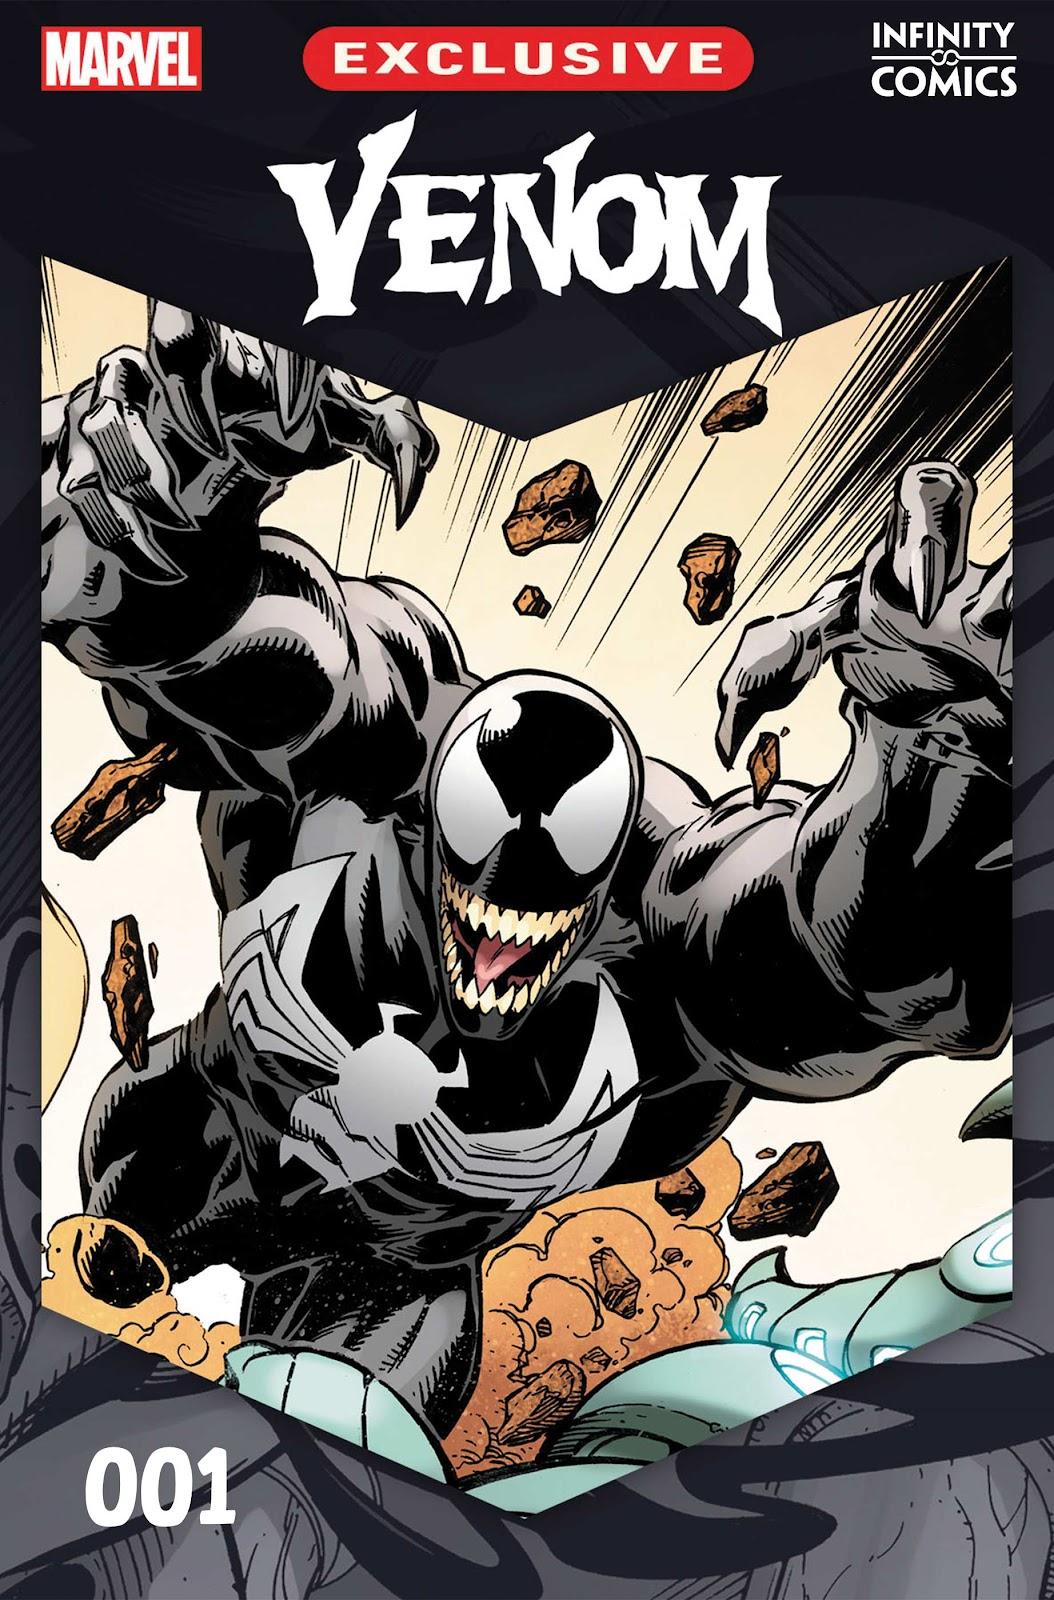 Venom: Infinity Comic Primer issue 1 - Page 1